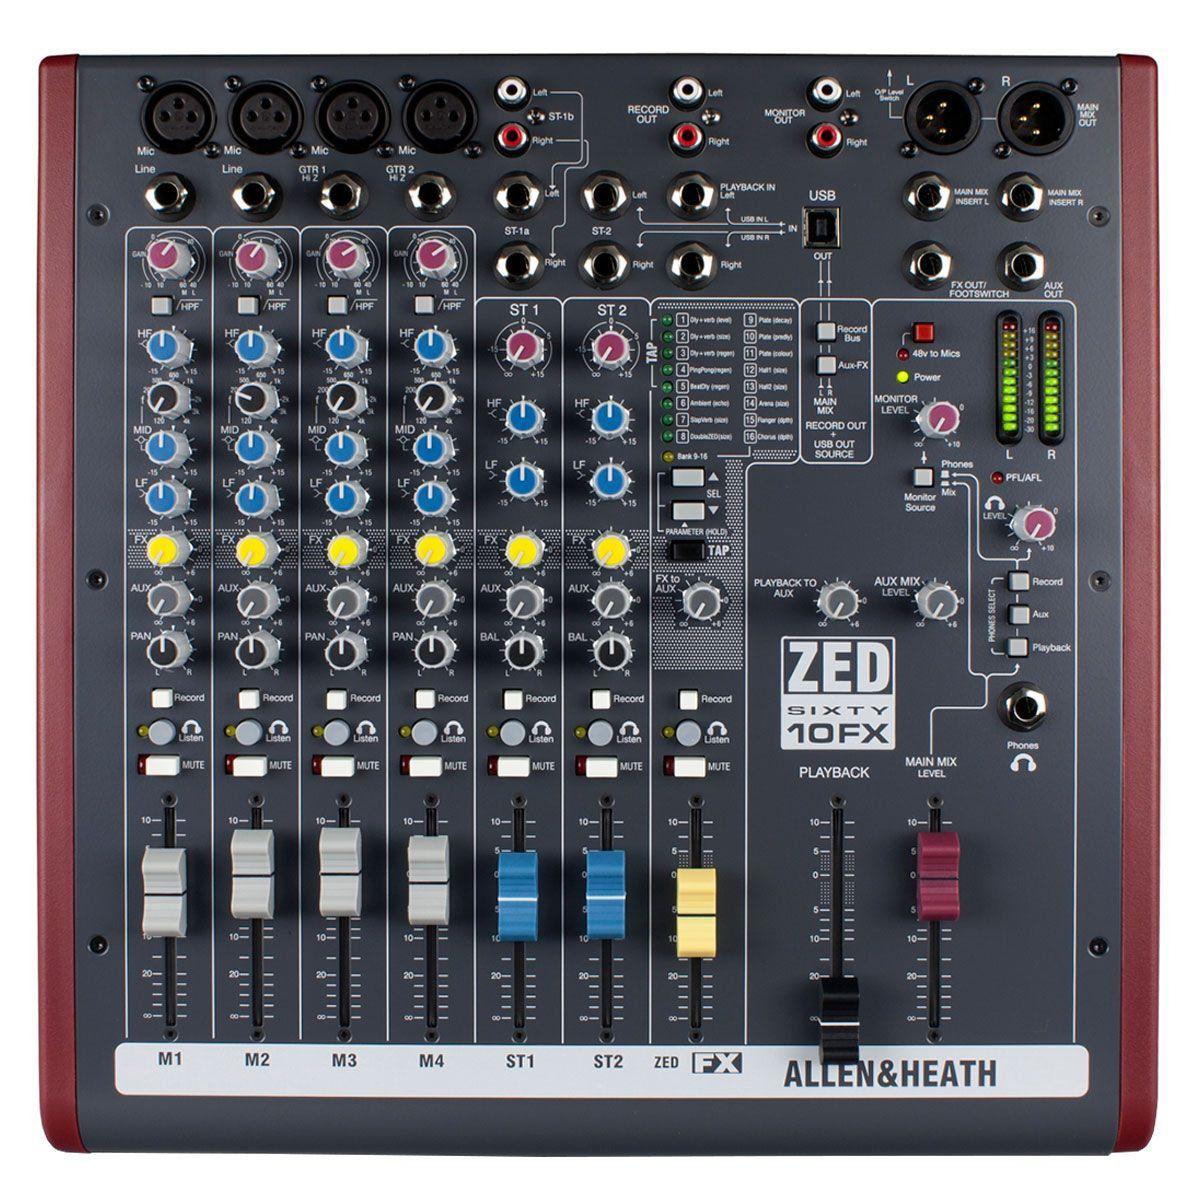 Mesa de Som 8 Canais Balanceados (4 XLR + 4 P10) c/ USB / Efeito / Phantom / 1 Auxiliar - ZED 60 10 FX Allen Heath